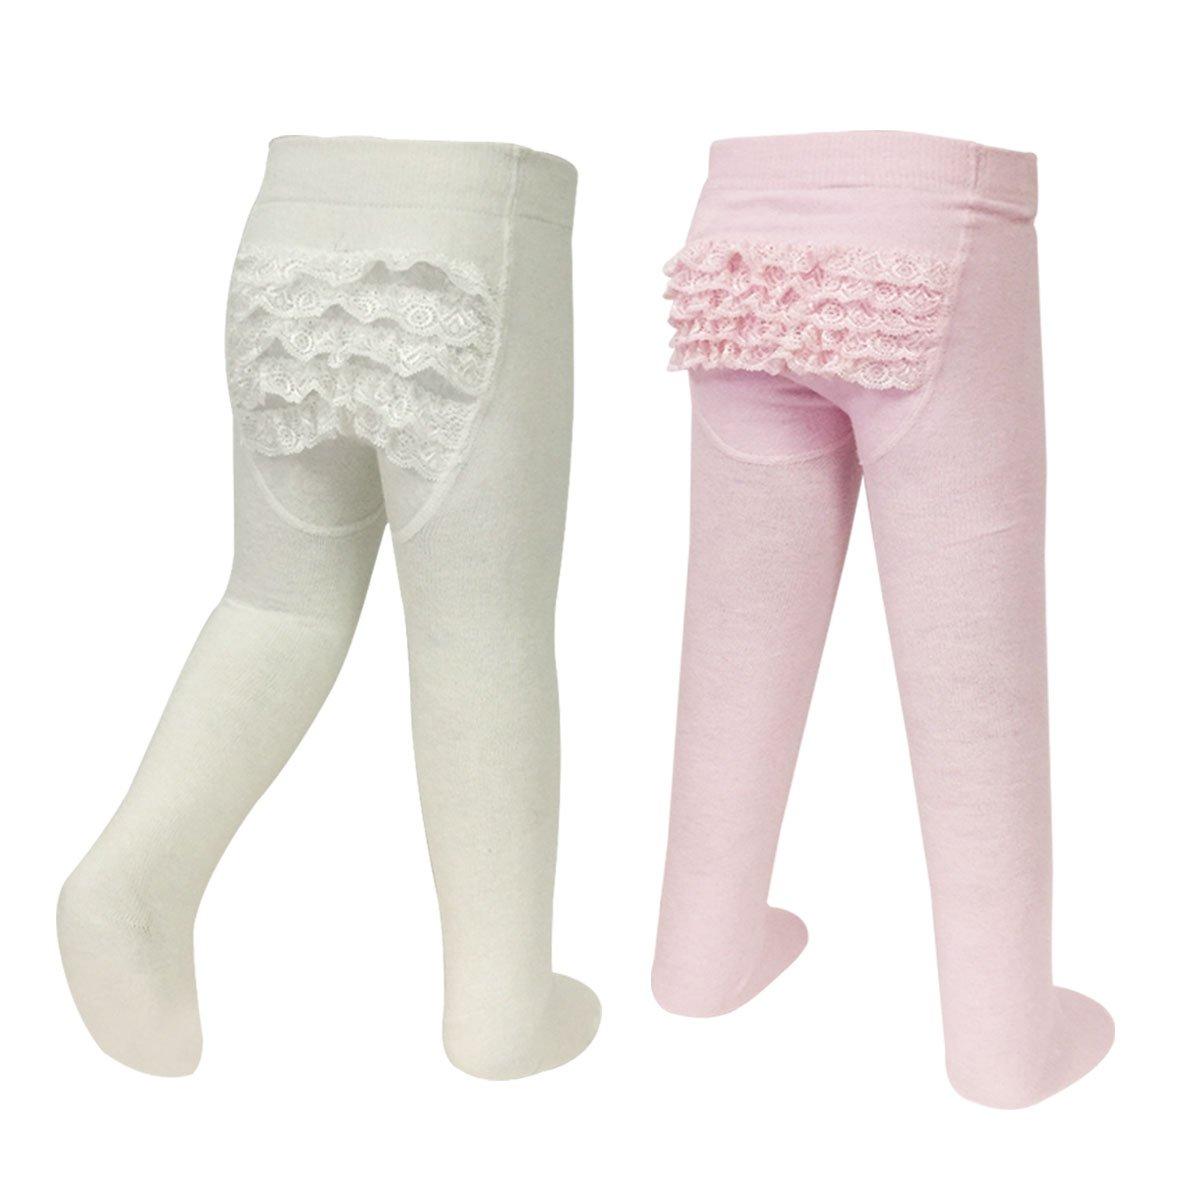 Bowbear 2-Pair Little Girl Ruffle Bottom Cotton Tights (Pink & Ivory)